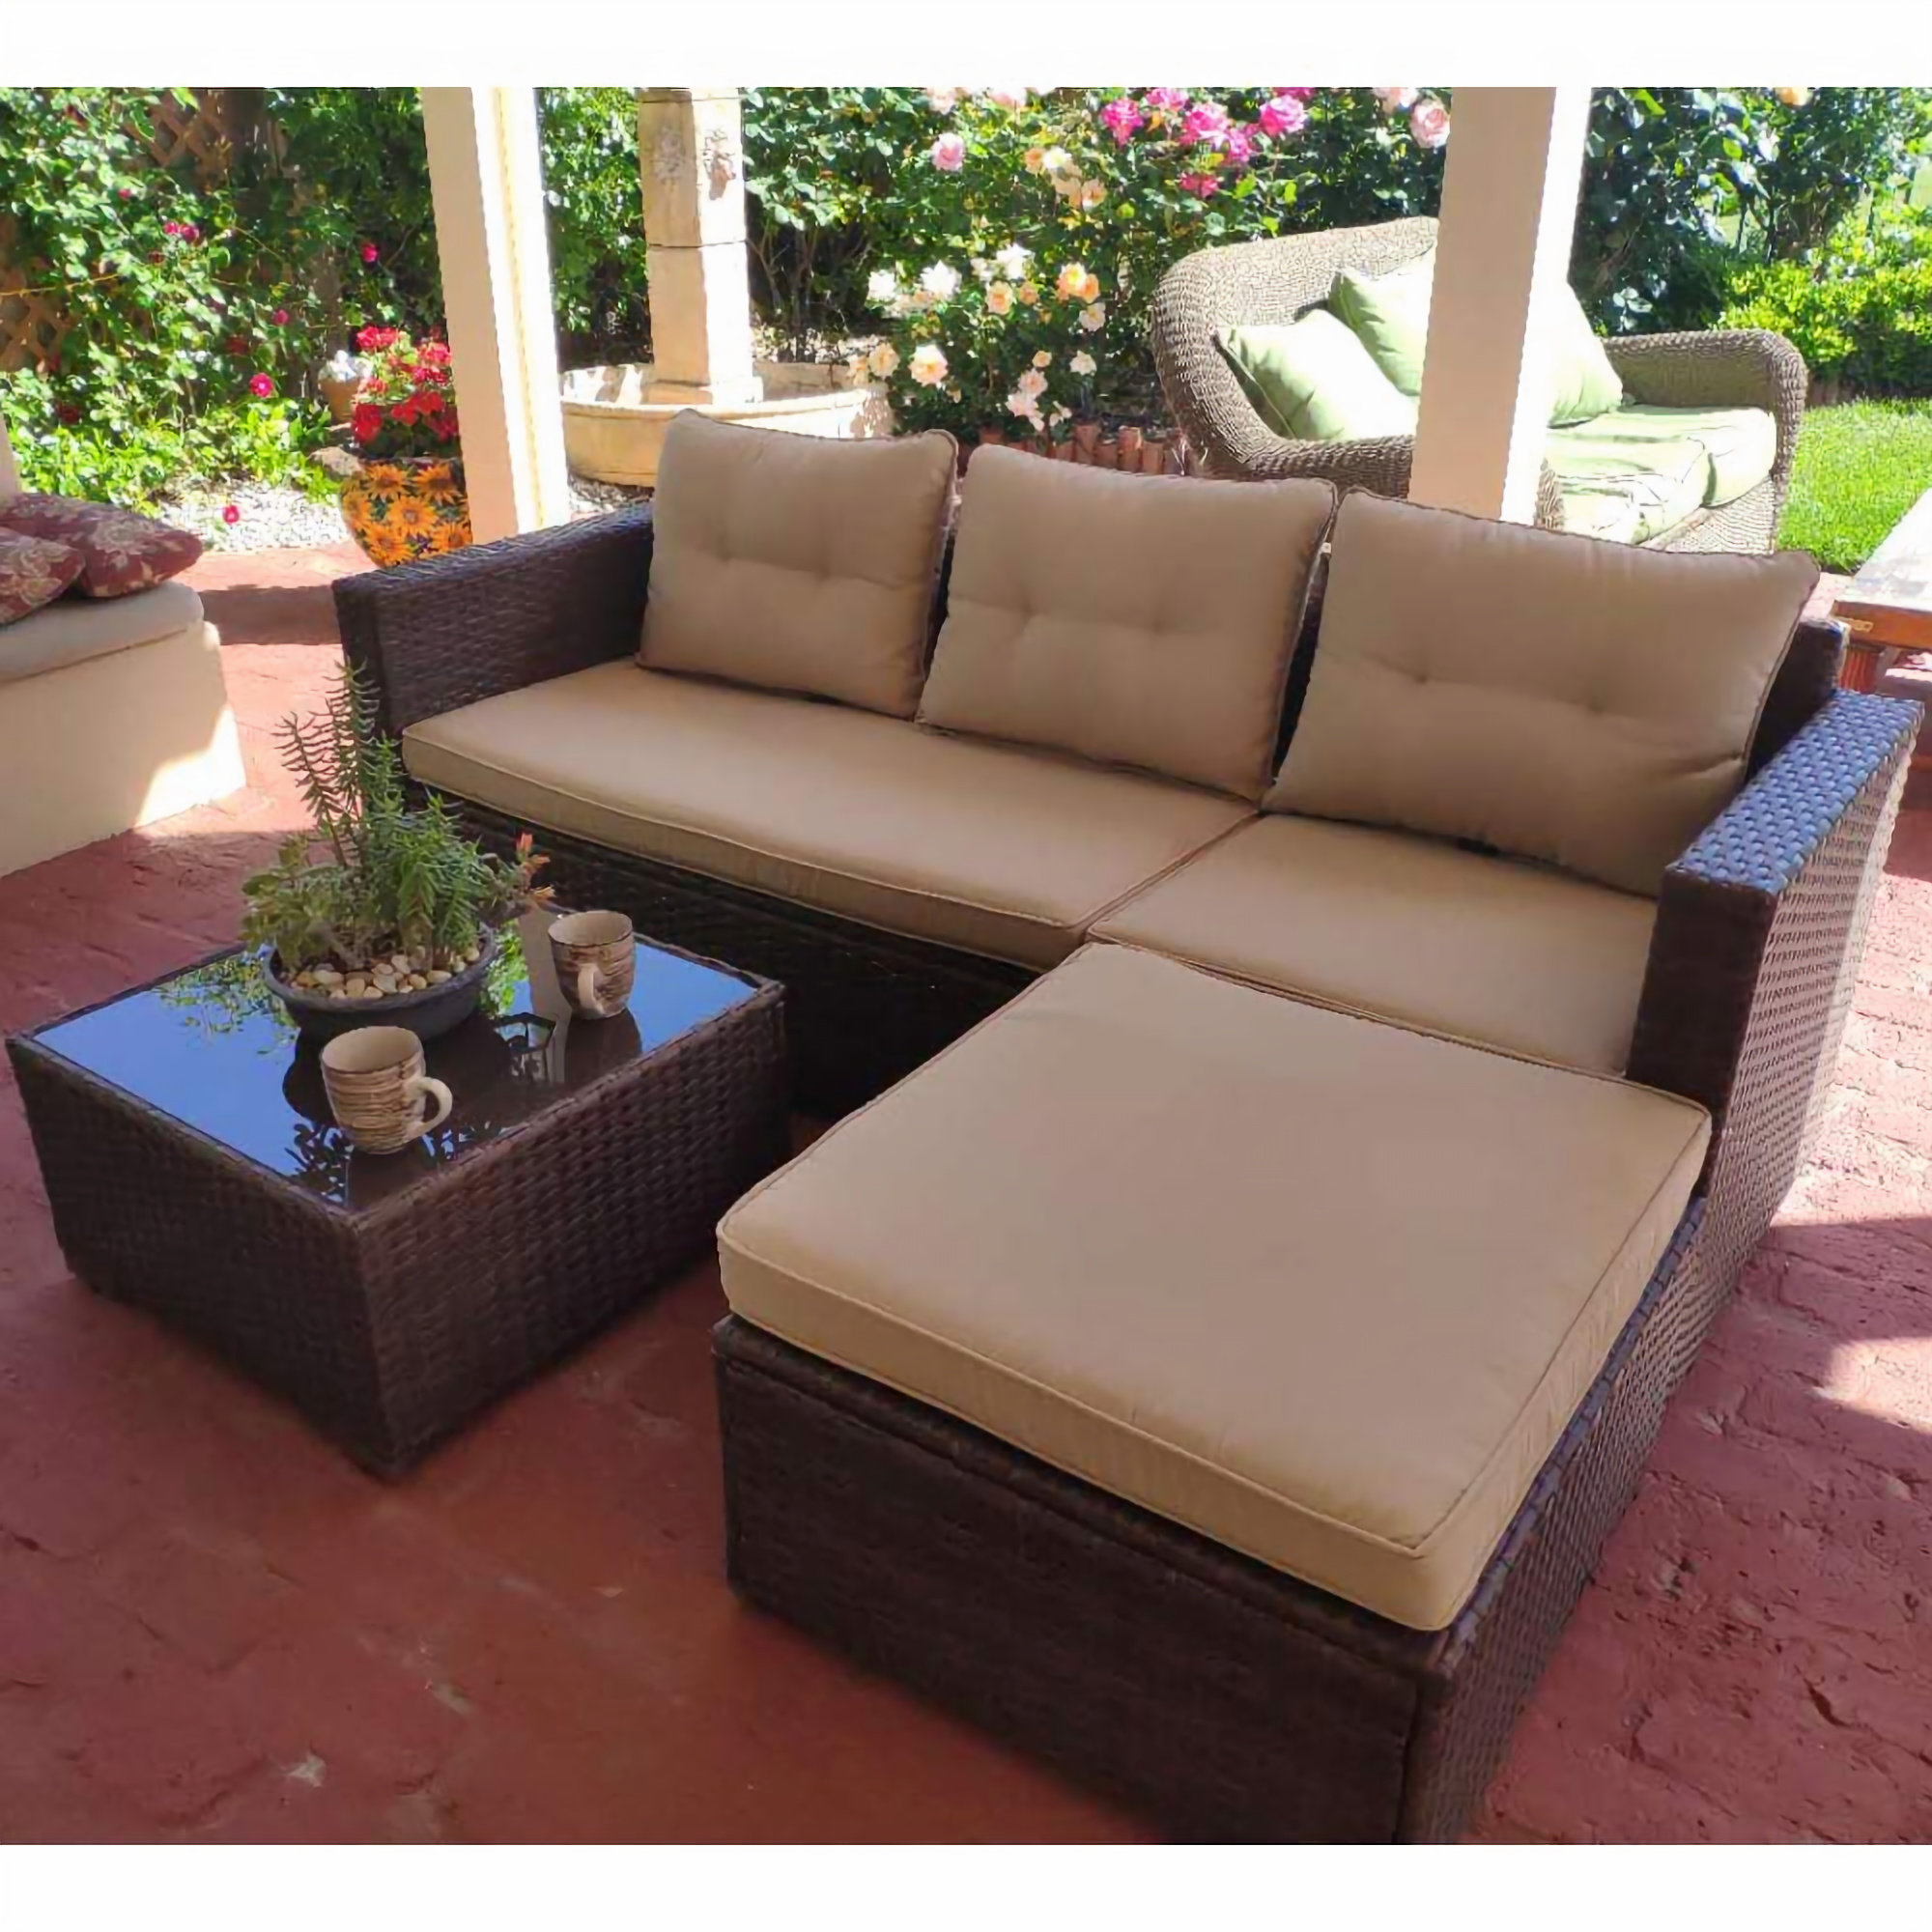 SUNSITT Outdoor Sectional Sofa 4 Piece Set   Comfy Niche on Outdoor 4 Piece Sectional id=37281